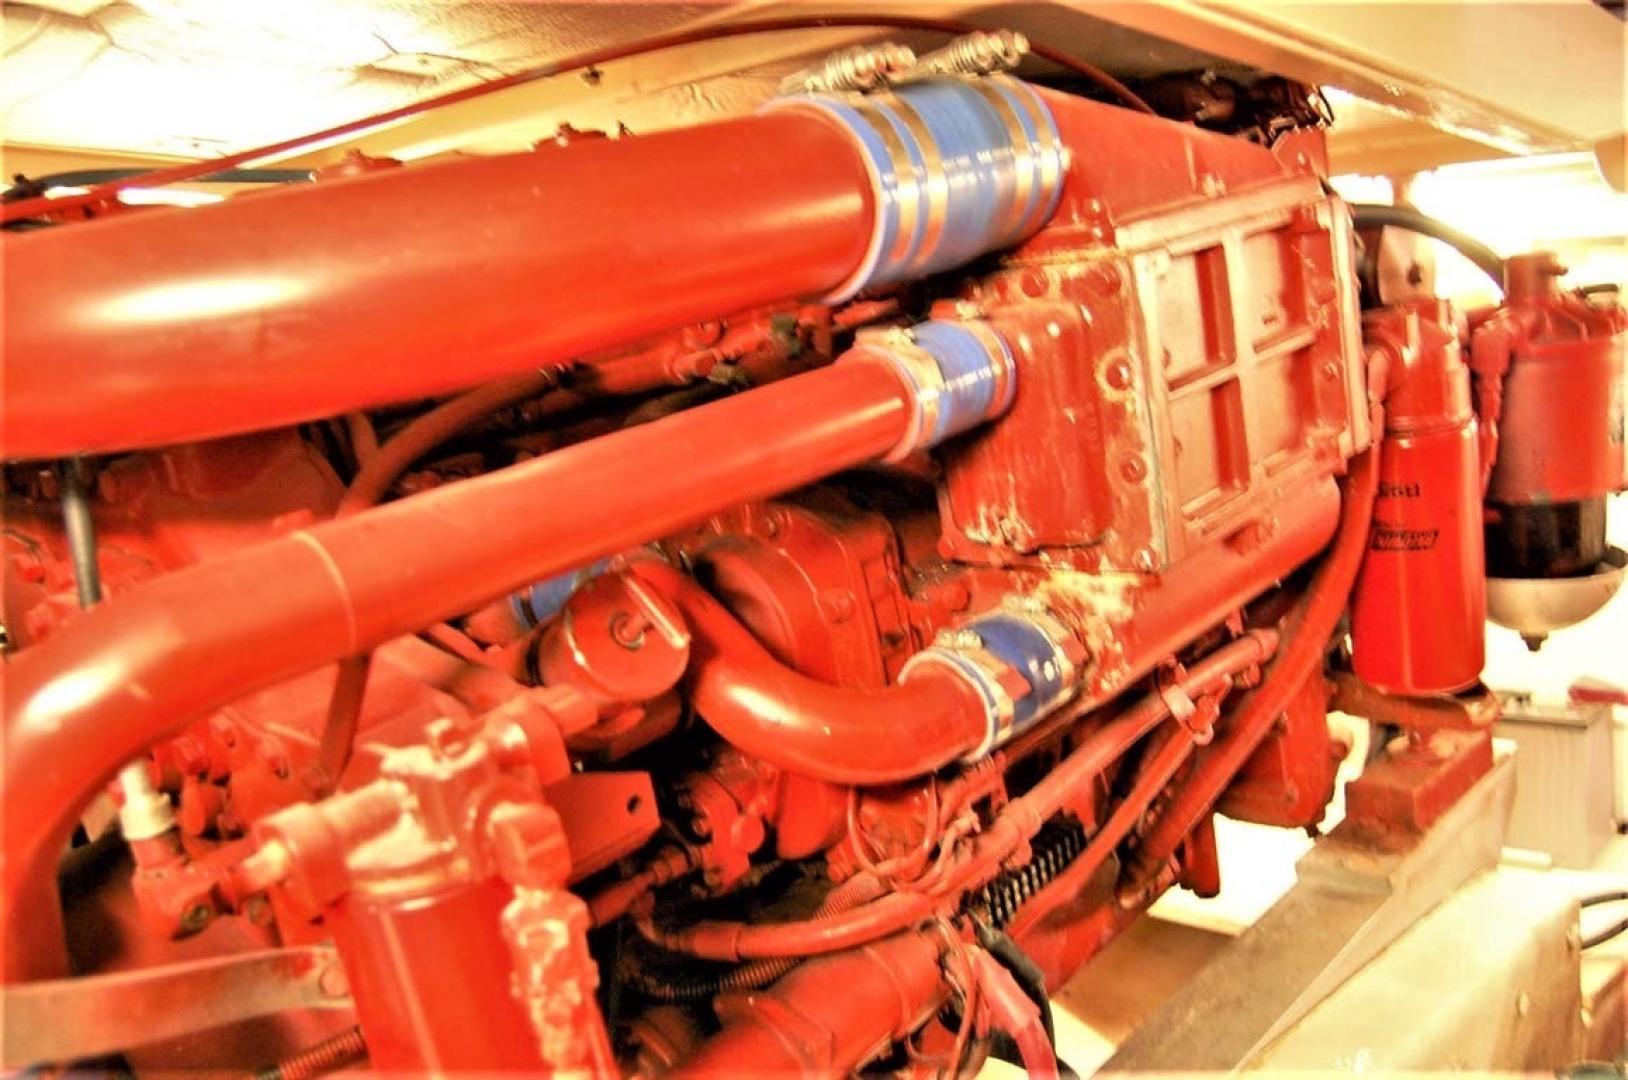 Jersey-42 Convertible Sportfisherman 1990-Mr. Breeze Center Moriches-New York-United States-Port Engine-1346381 | Thumbnail